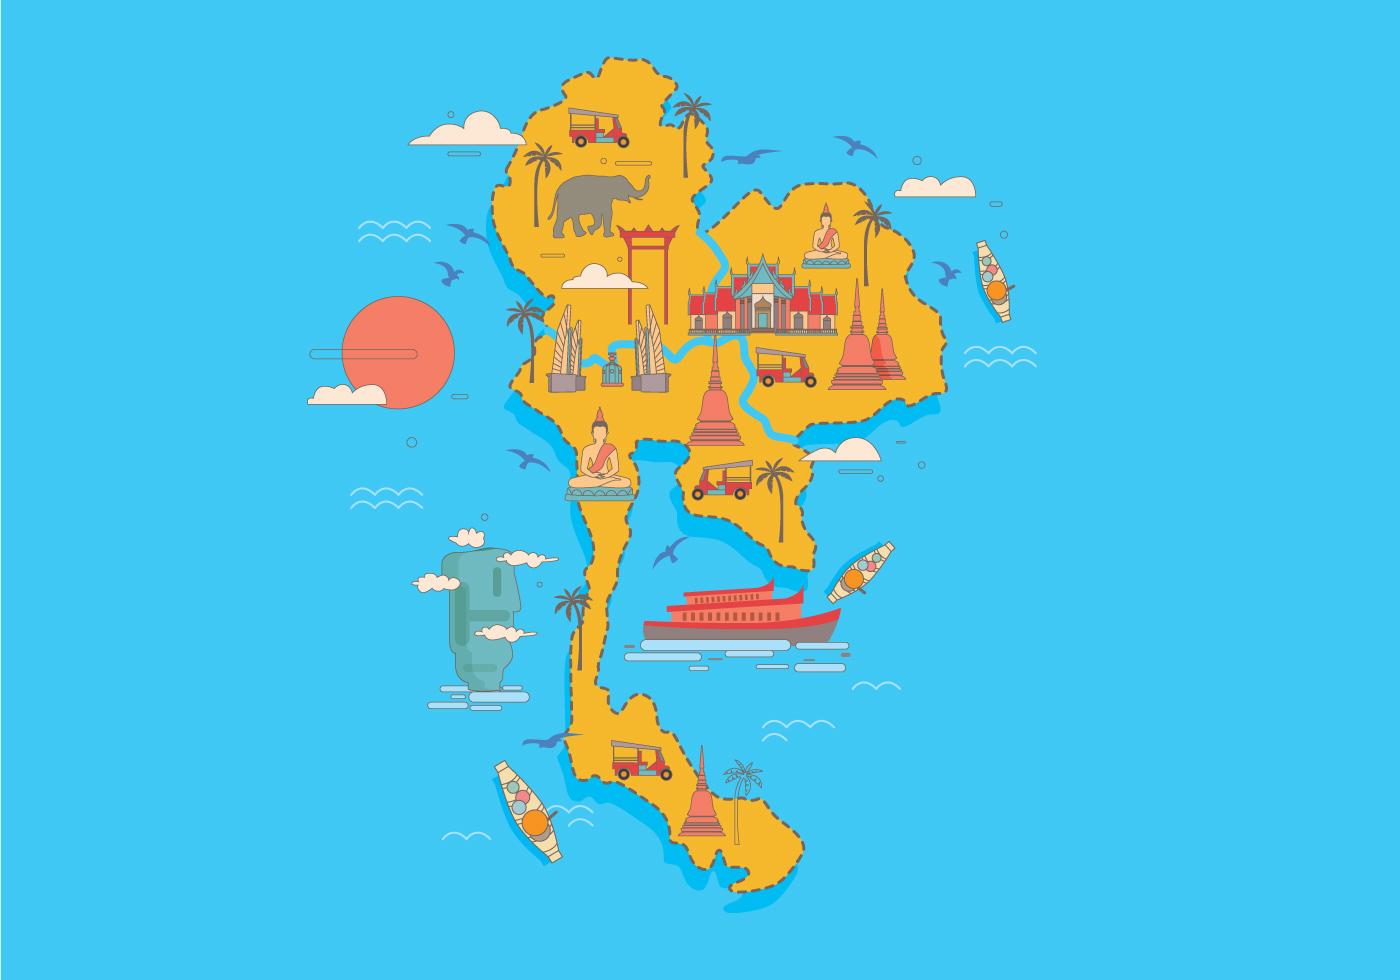 Thai Map Free Vector Art - (12,776 Free Downloads)